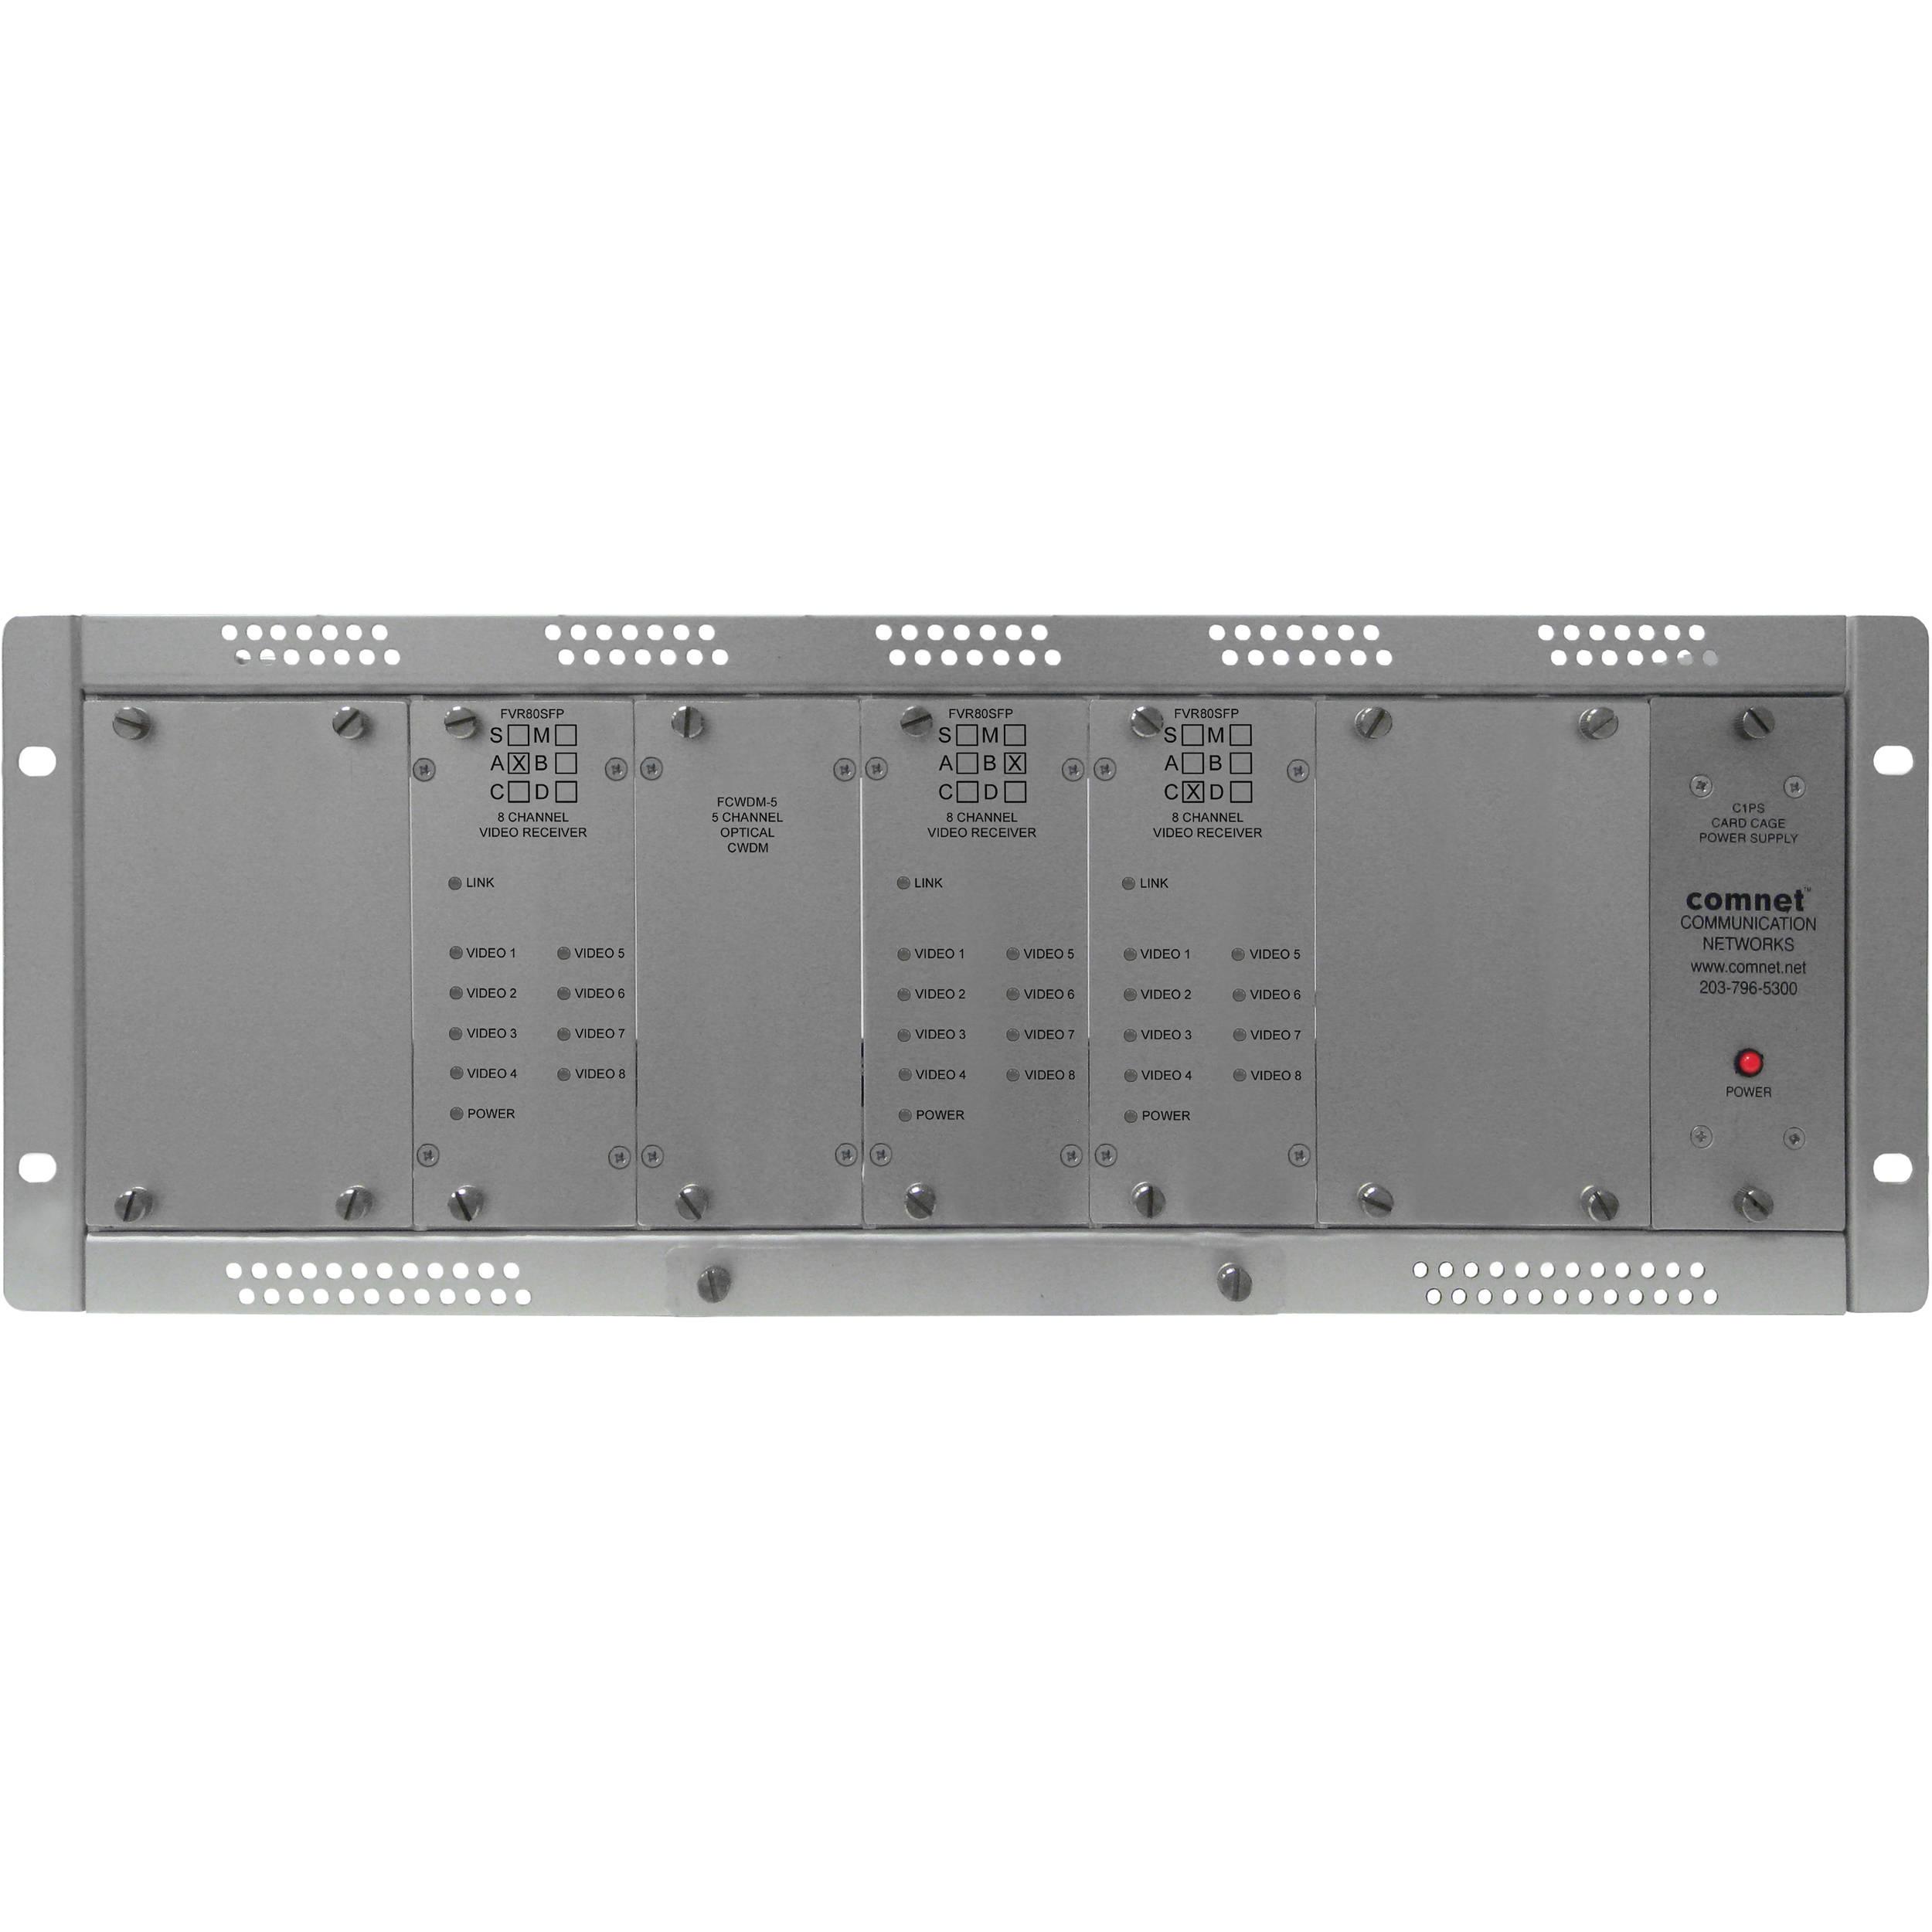 Https C Product 1291136 Reg Store Gt Tv Parts Circuit Boards X Y Sc Ss Sustain Samsung Comnet Fvr240s1 24 Channel Singlemode 10 Bit Digital 1253646